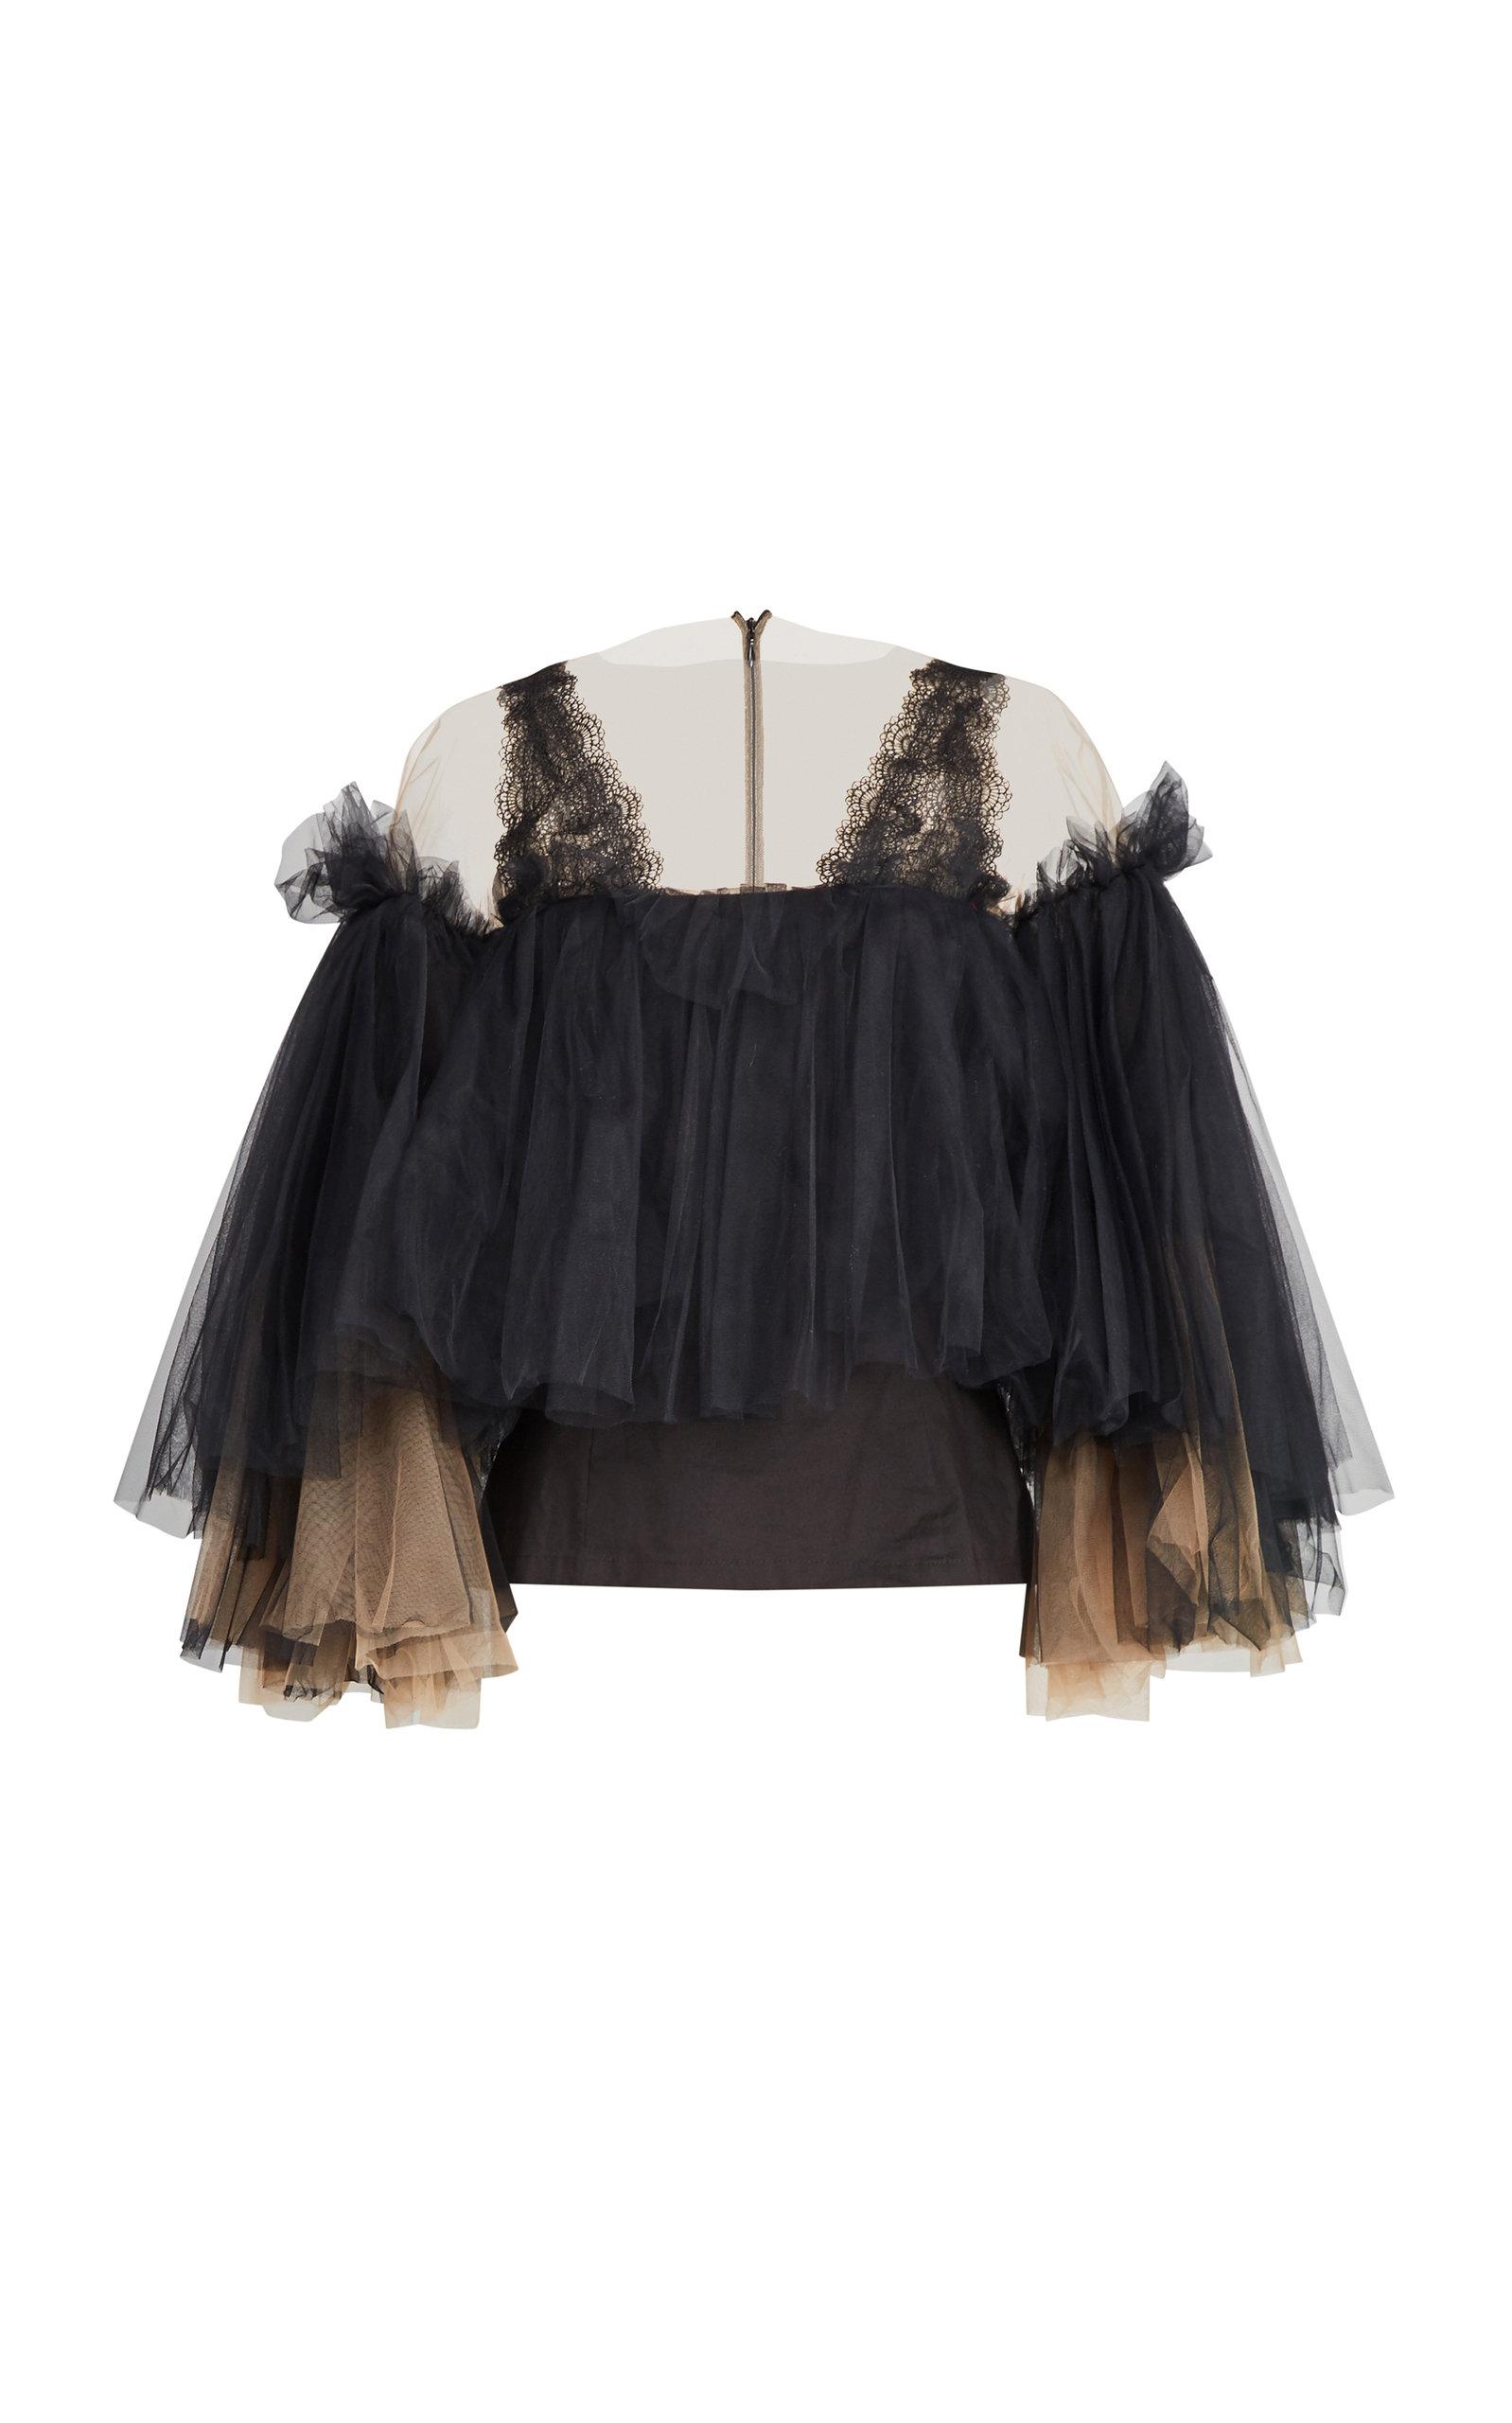 af69094a8db087 Ruffle Blouse by Yanina Demi Couture | Moda Operandi